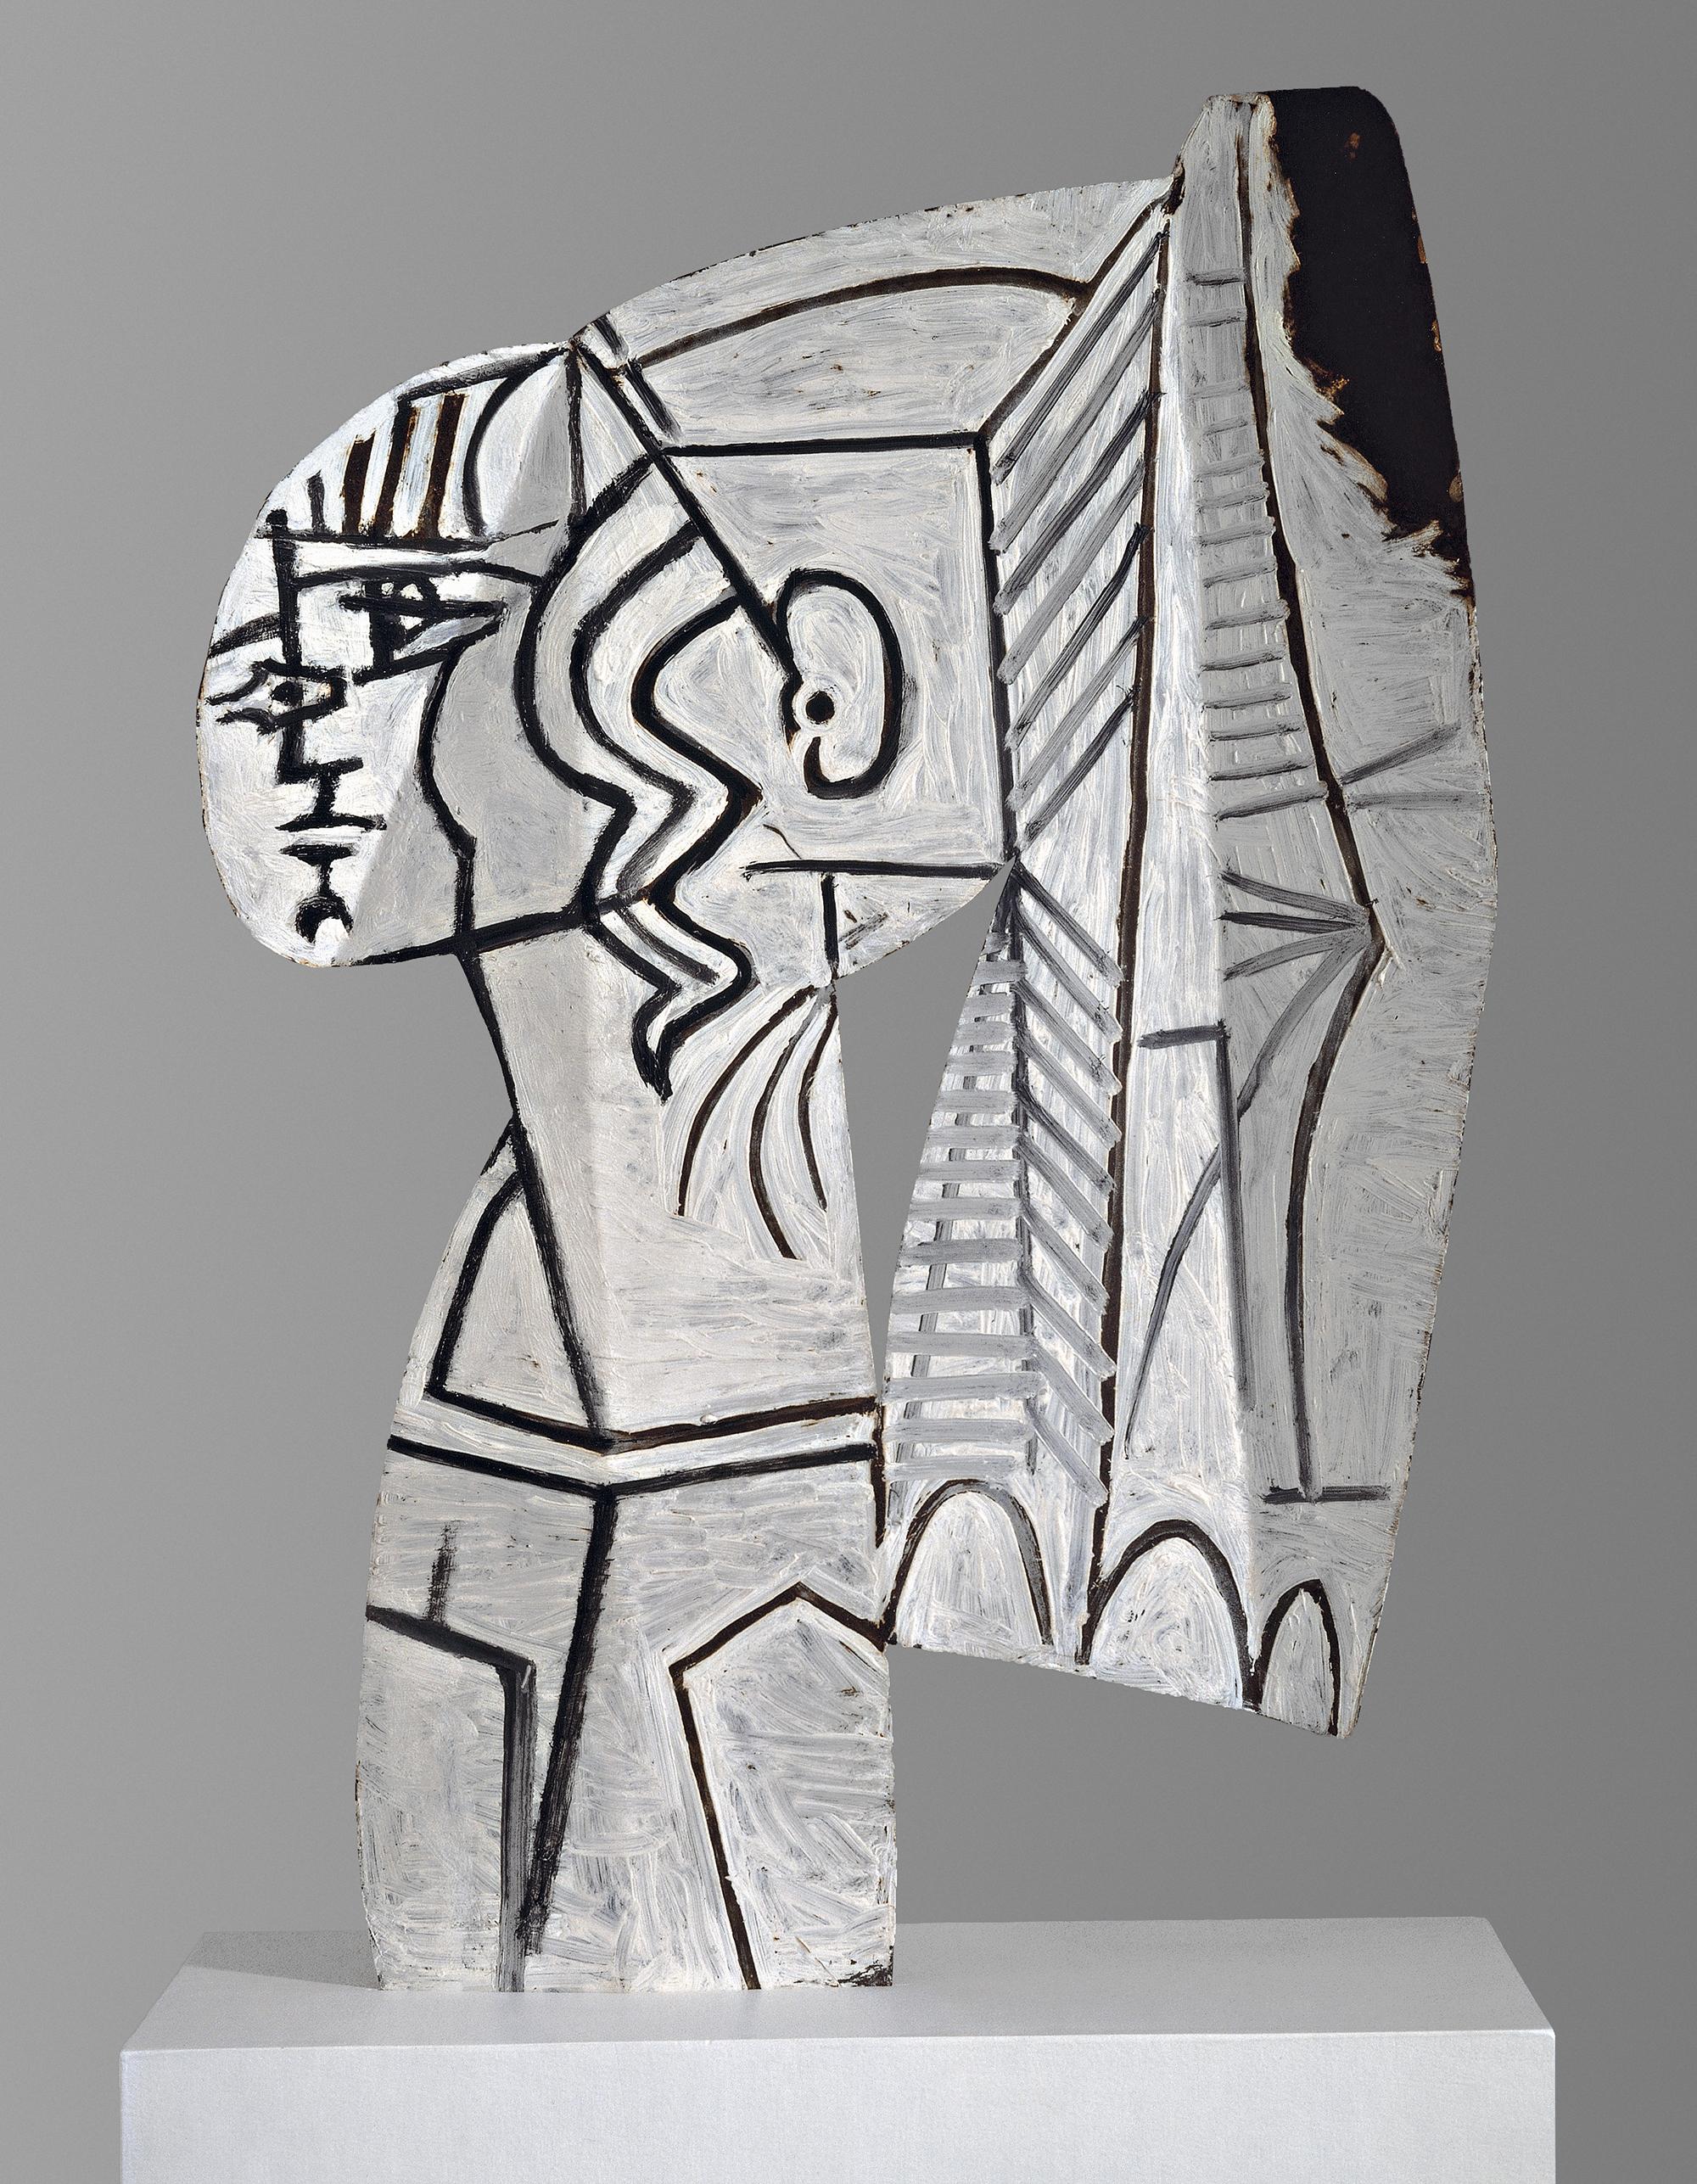 04.-Picasso.-Retrats_Pablo-Picasso_Sylvette